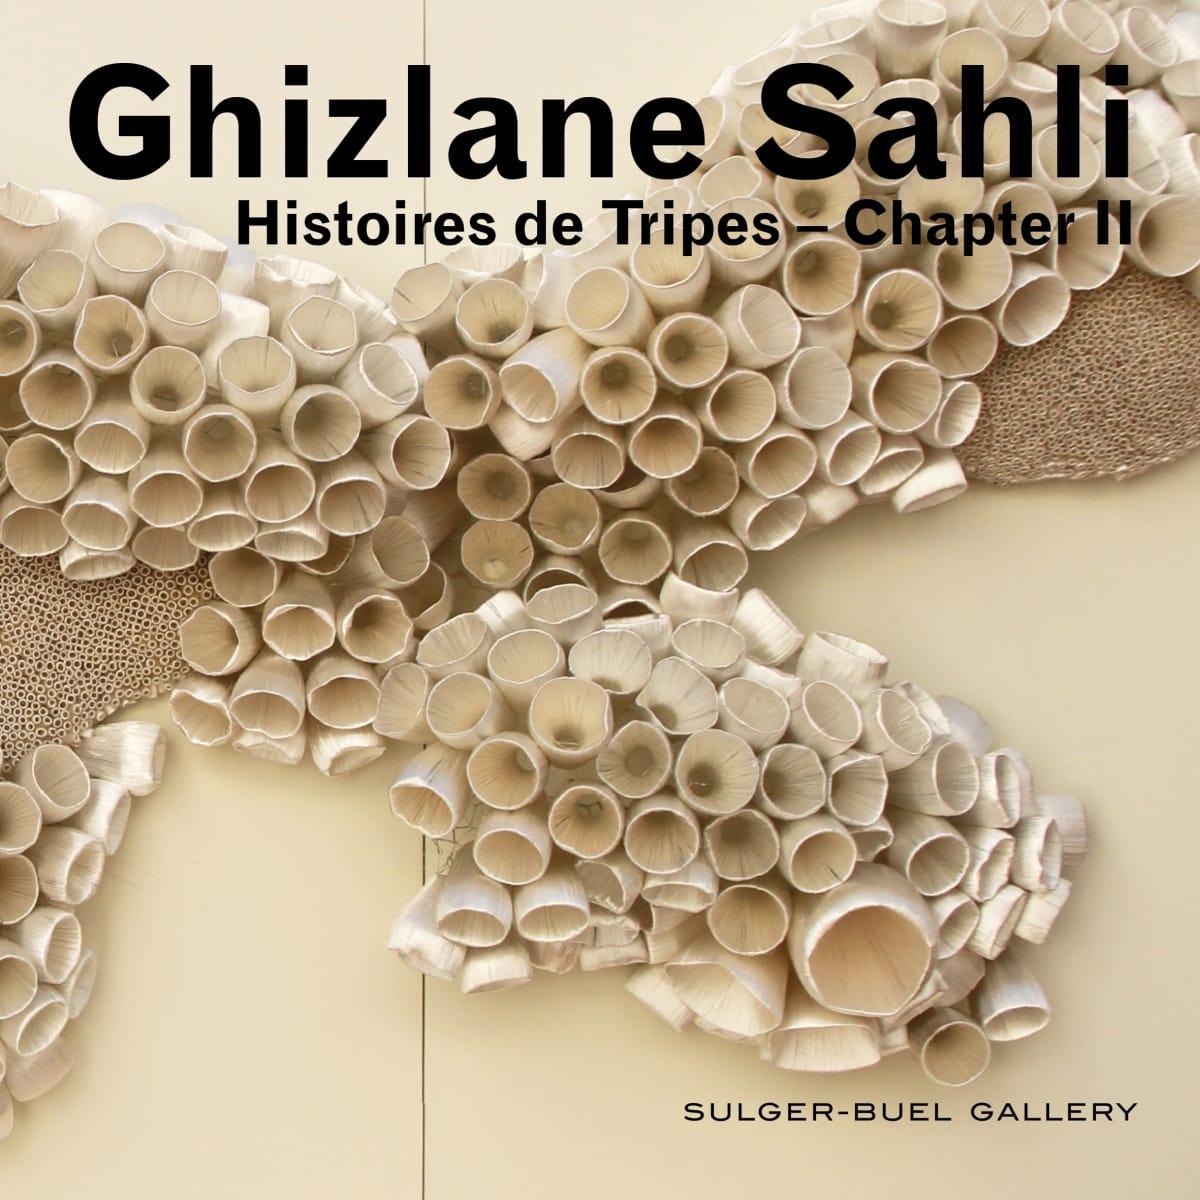 Ghizlane Sahli 'Histoires De Tripes - Chapter II'